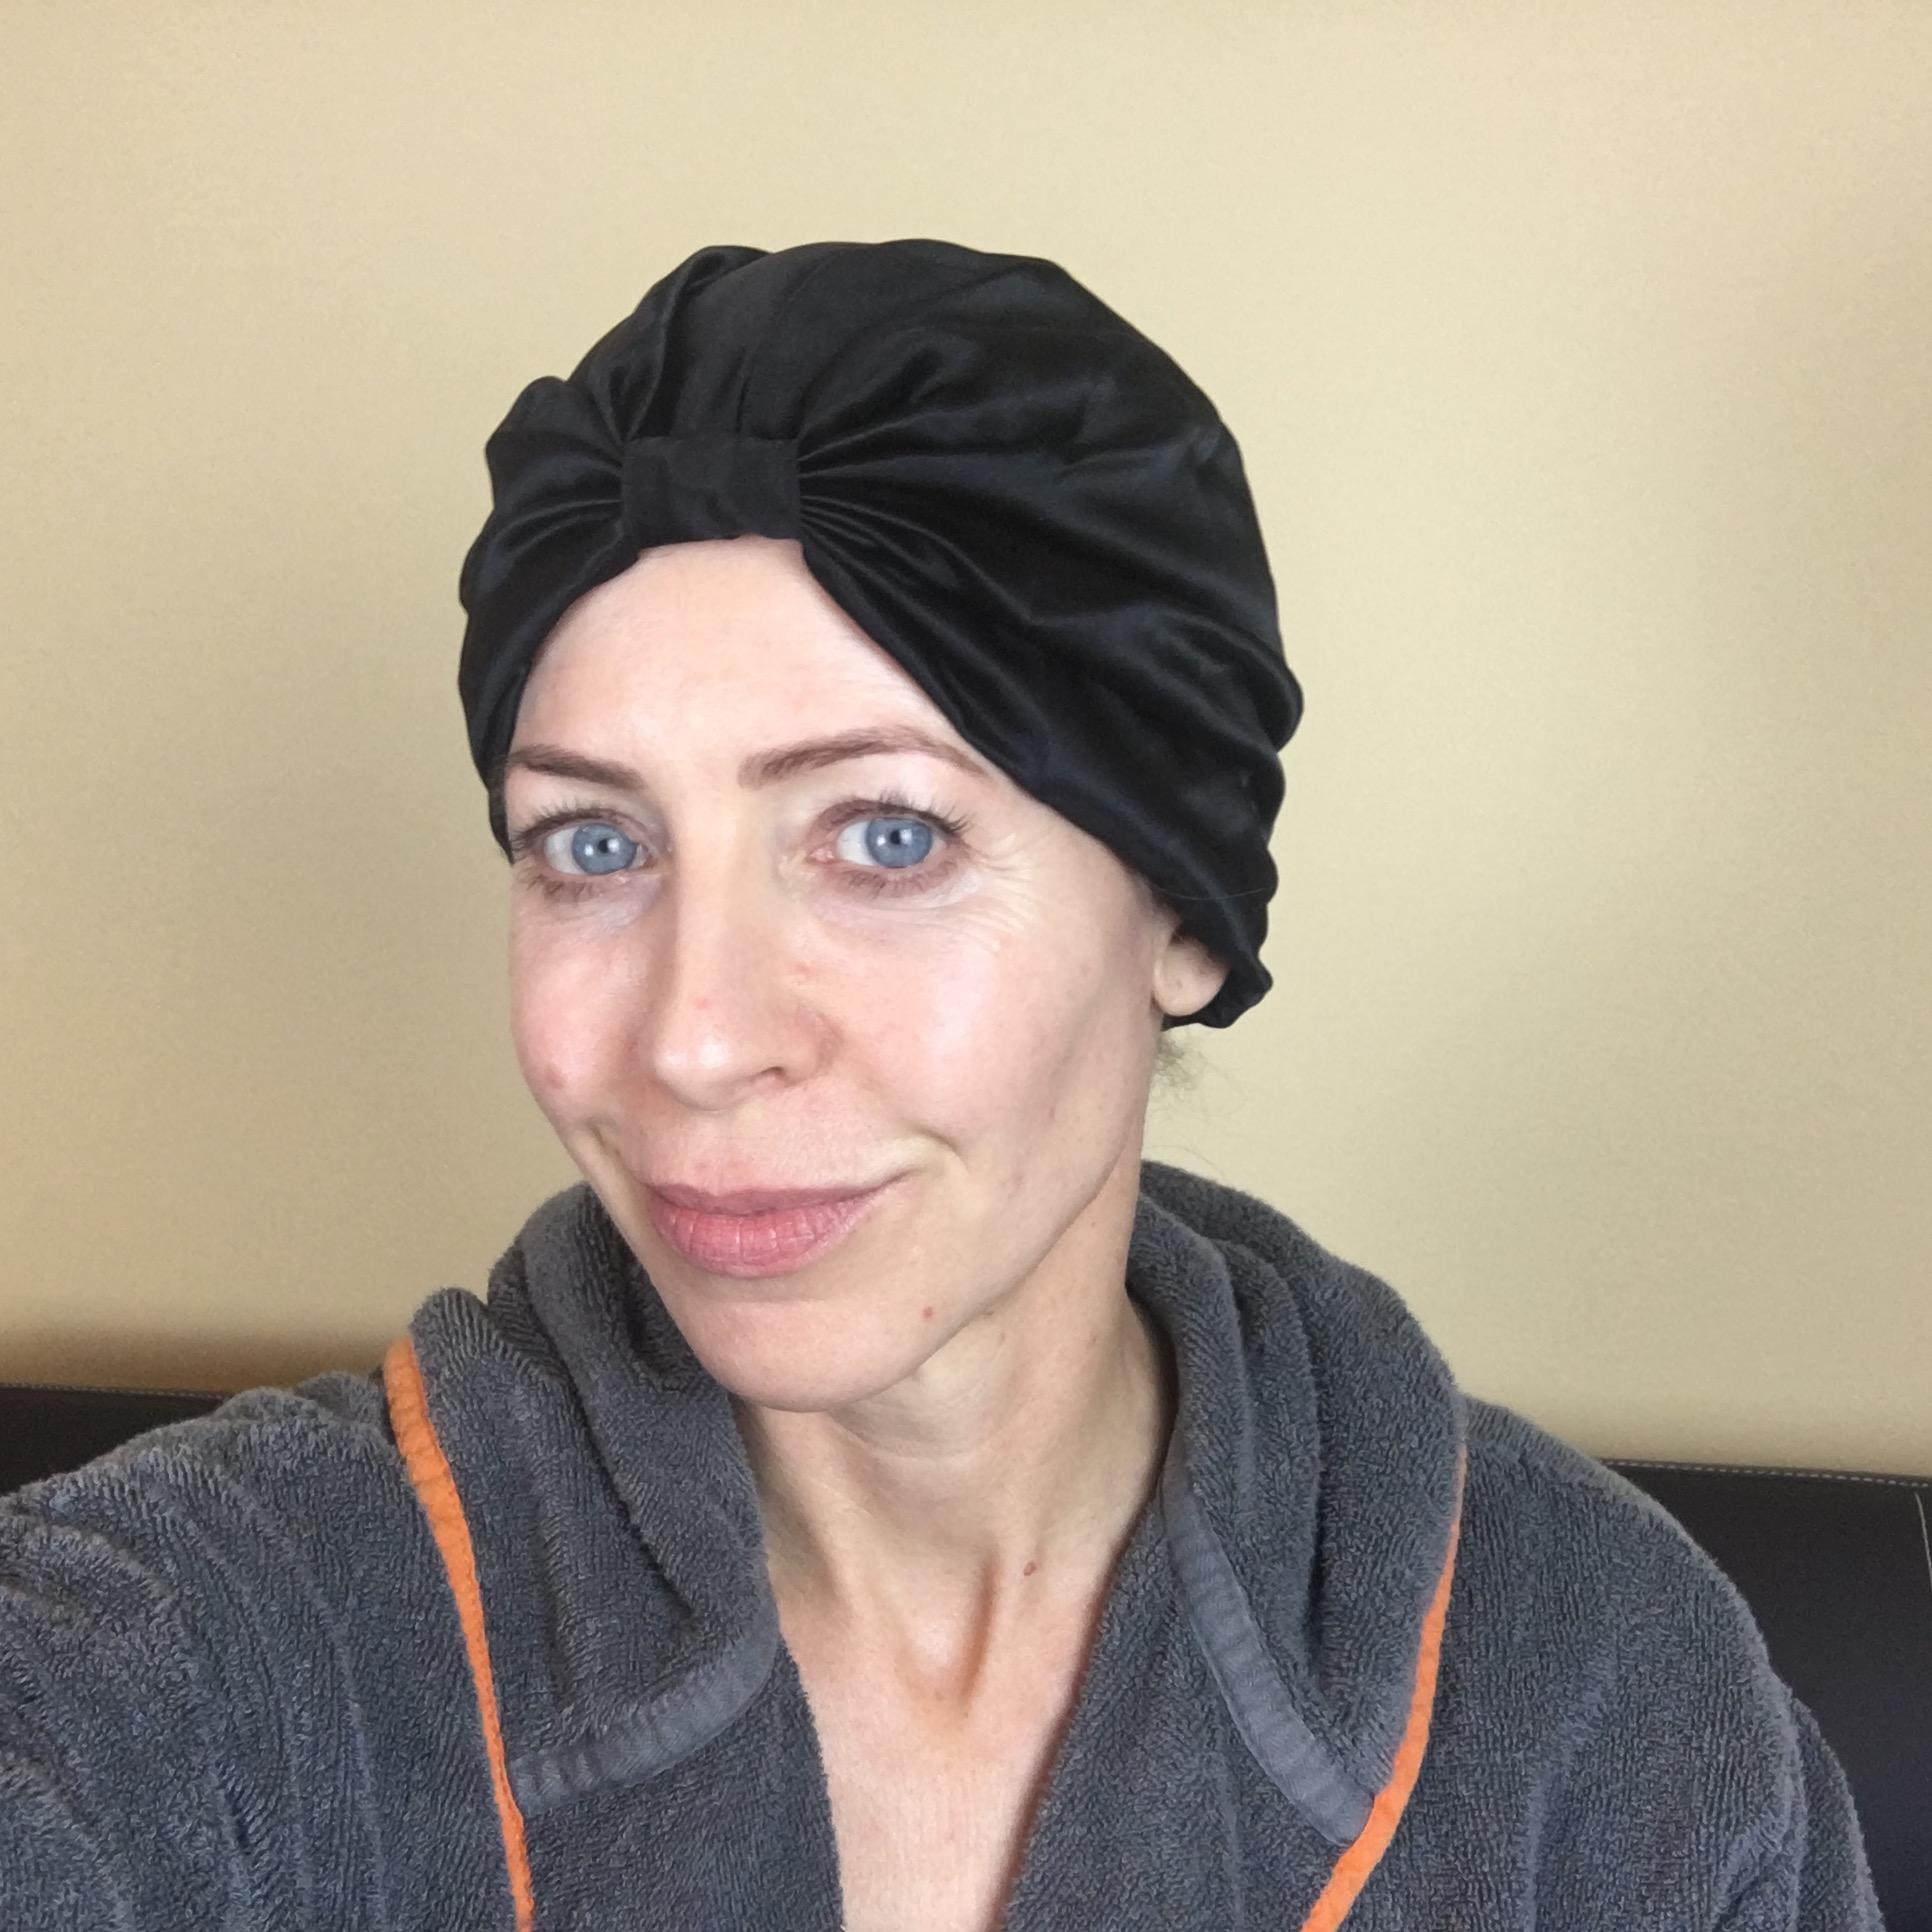 1930s style: the Silke hair wrap is styled like a turban